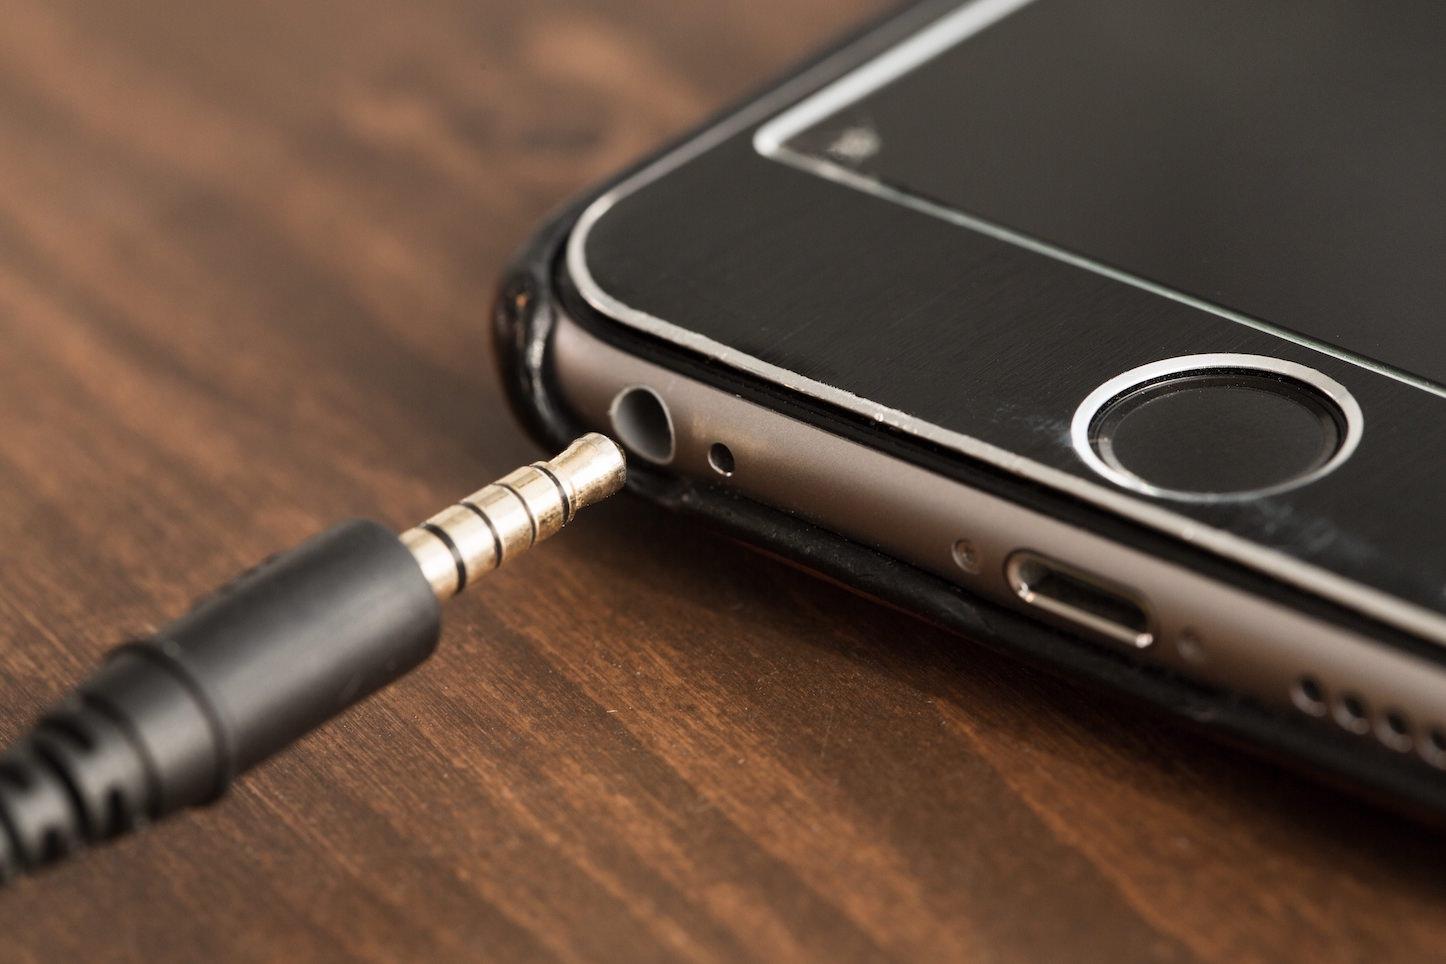 Iphone and headphone jack